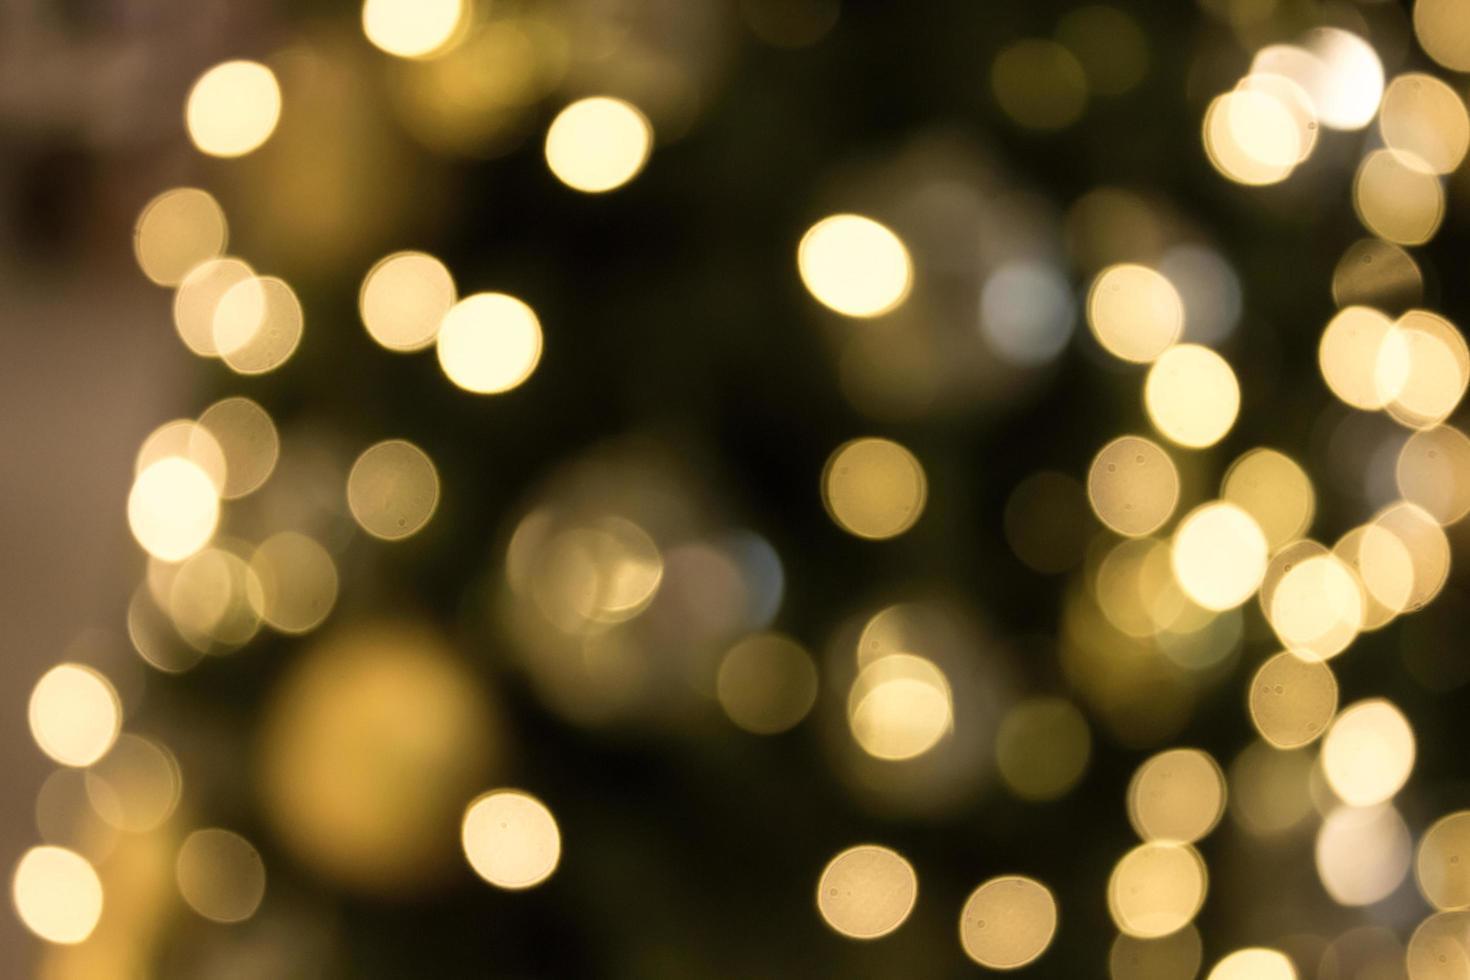 navidad con fondo dorado claro bokeh foto